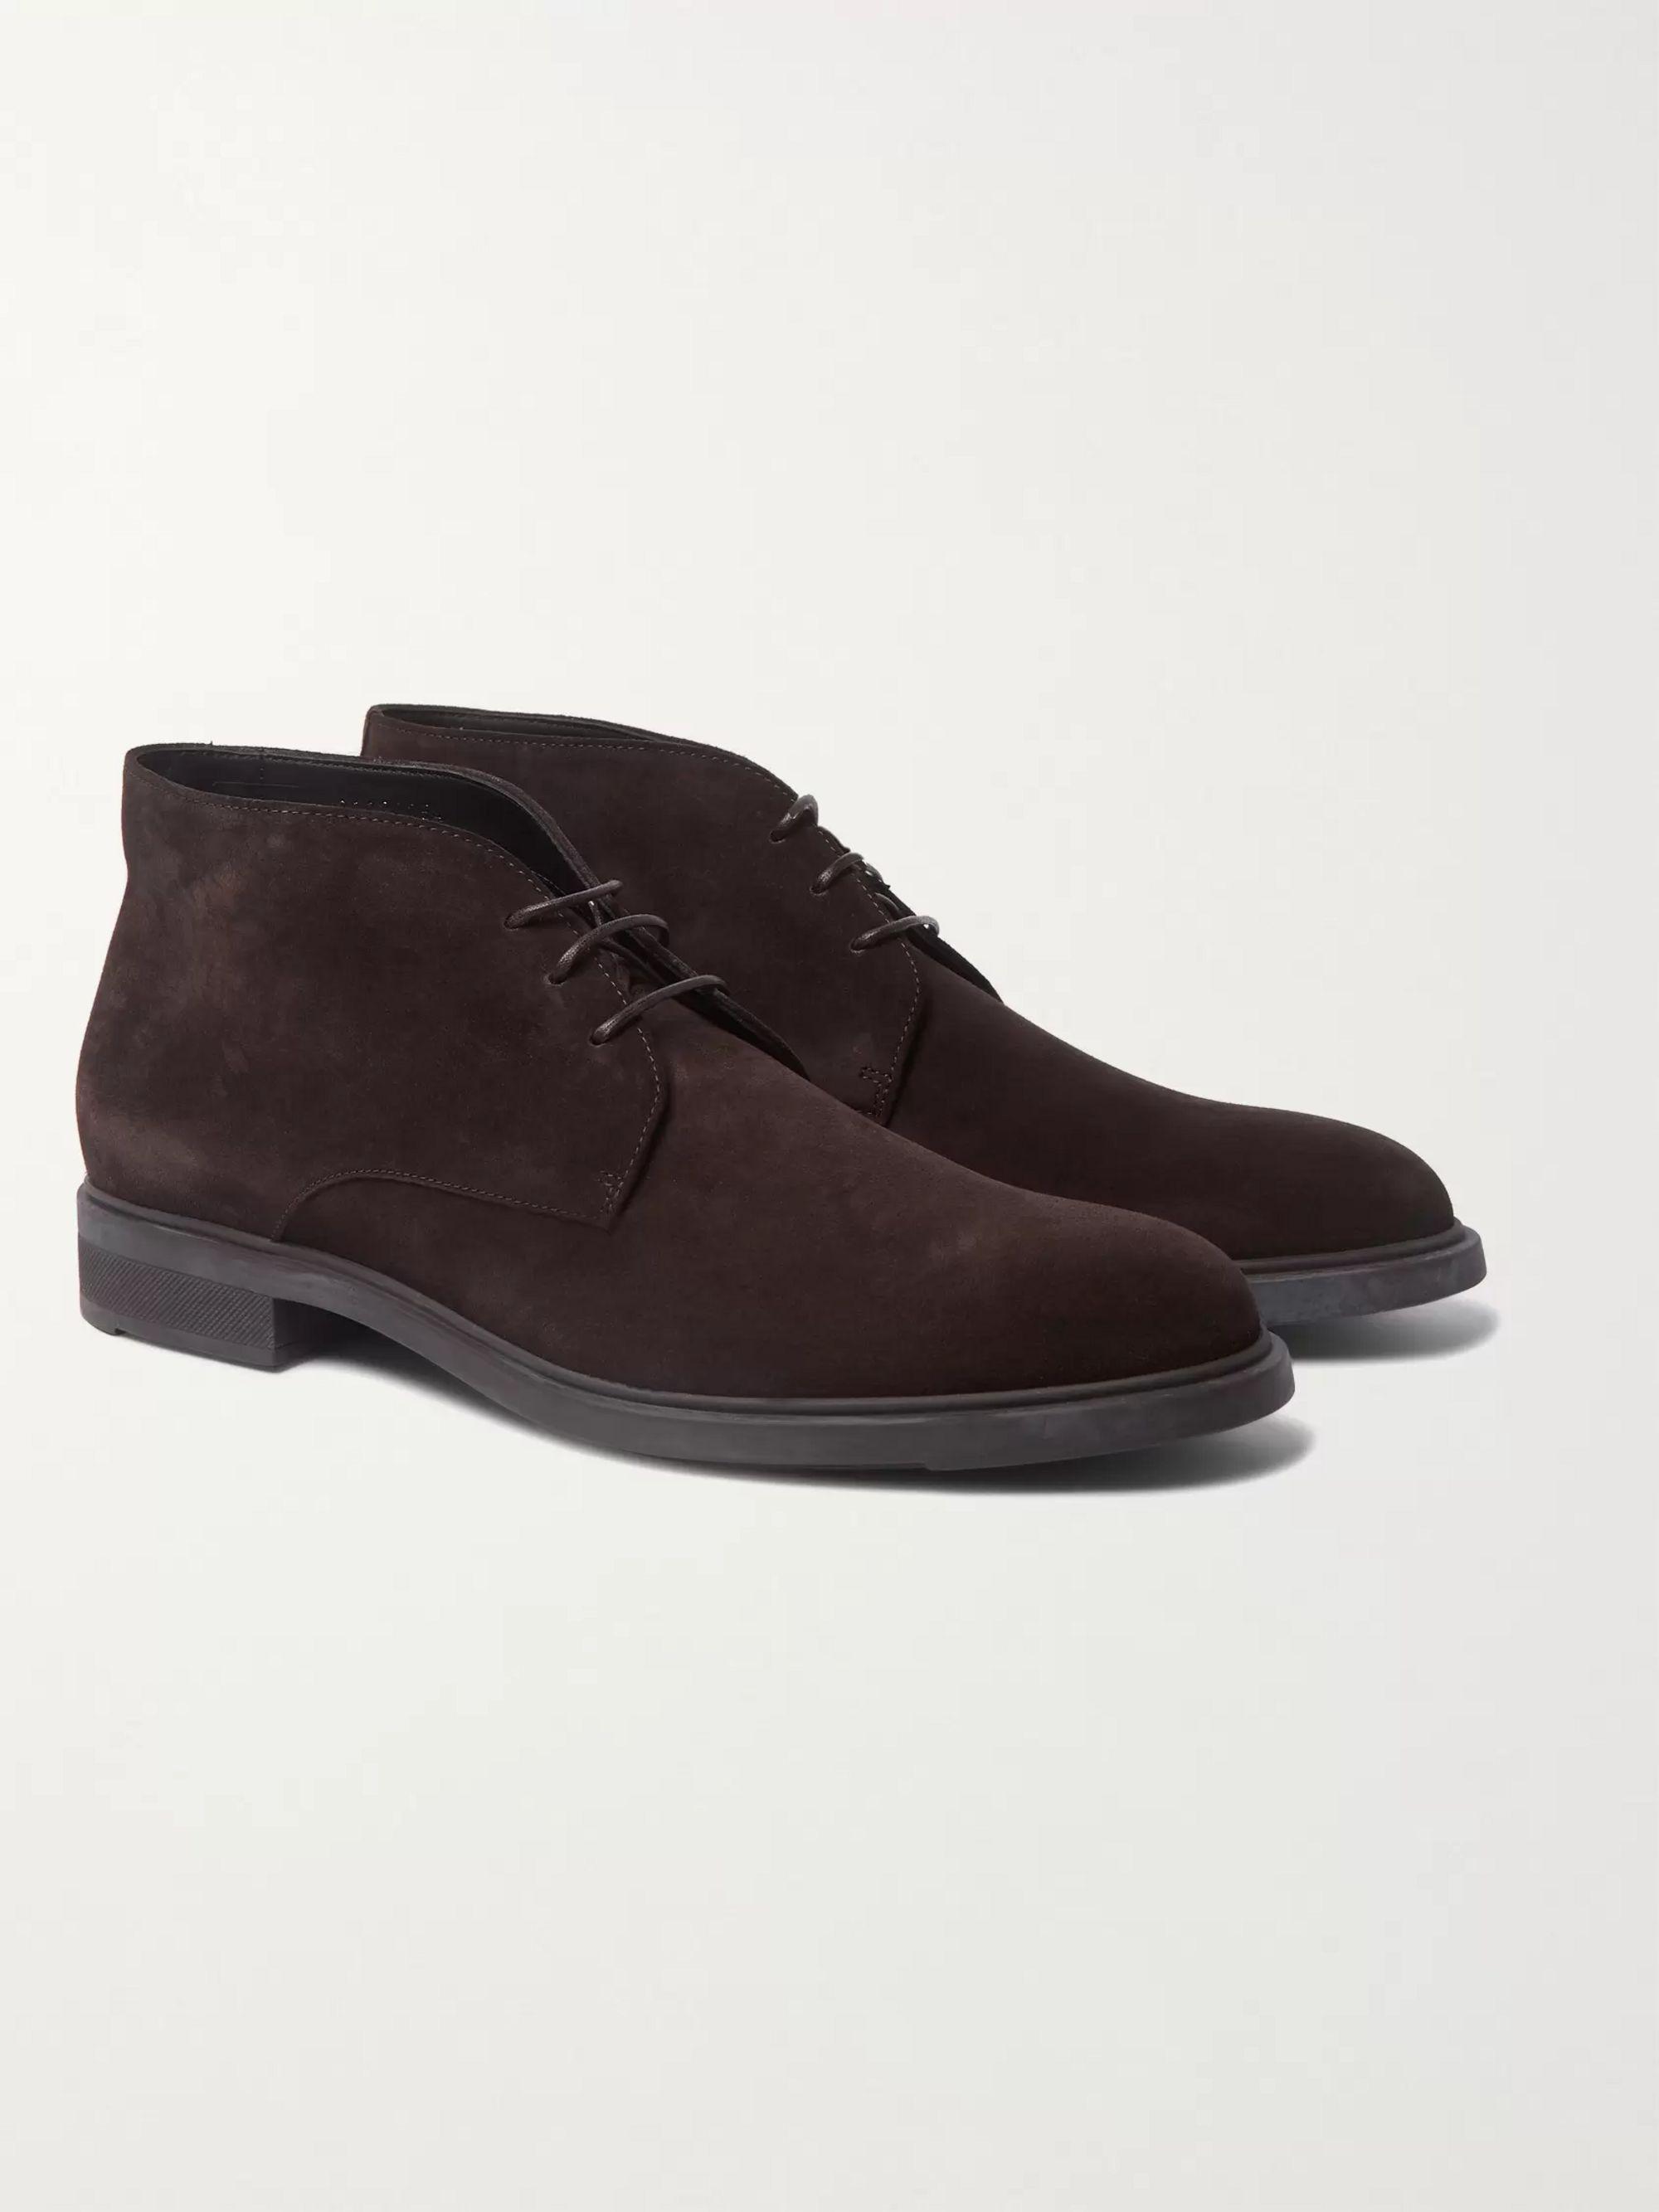 HUGO BOSS Suede Desert Boots